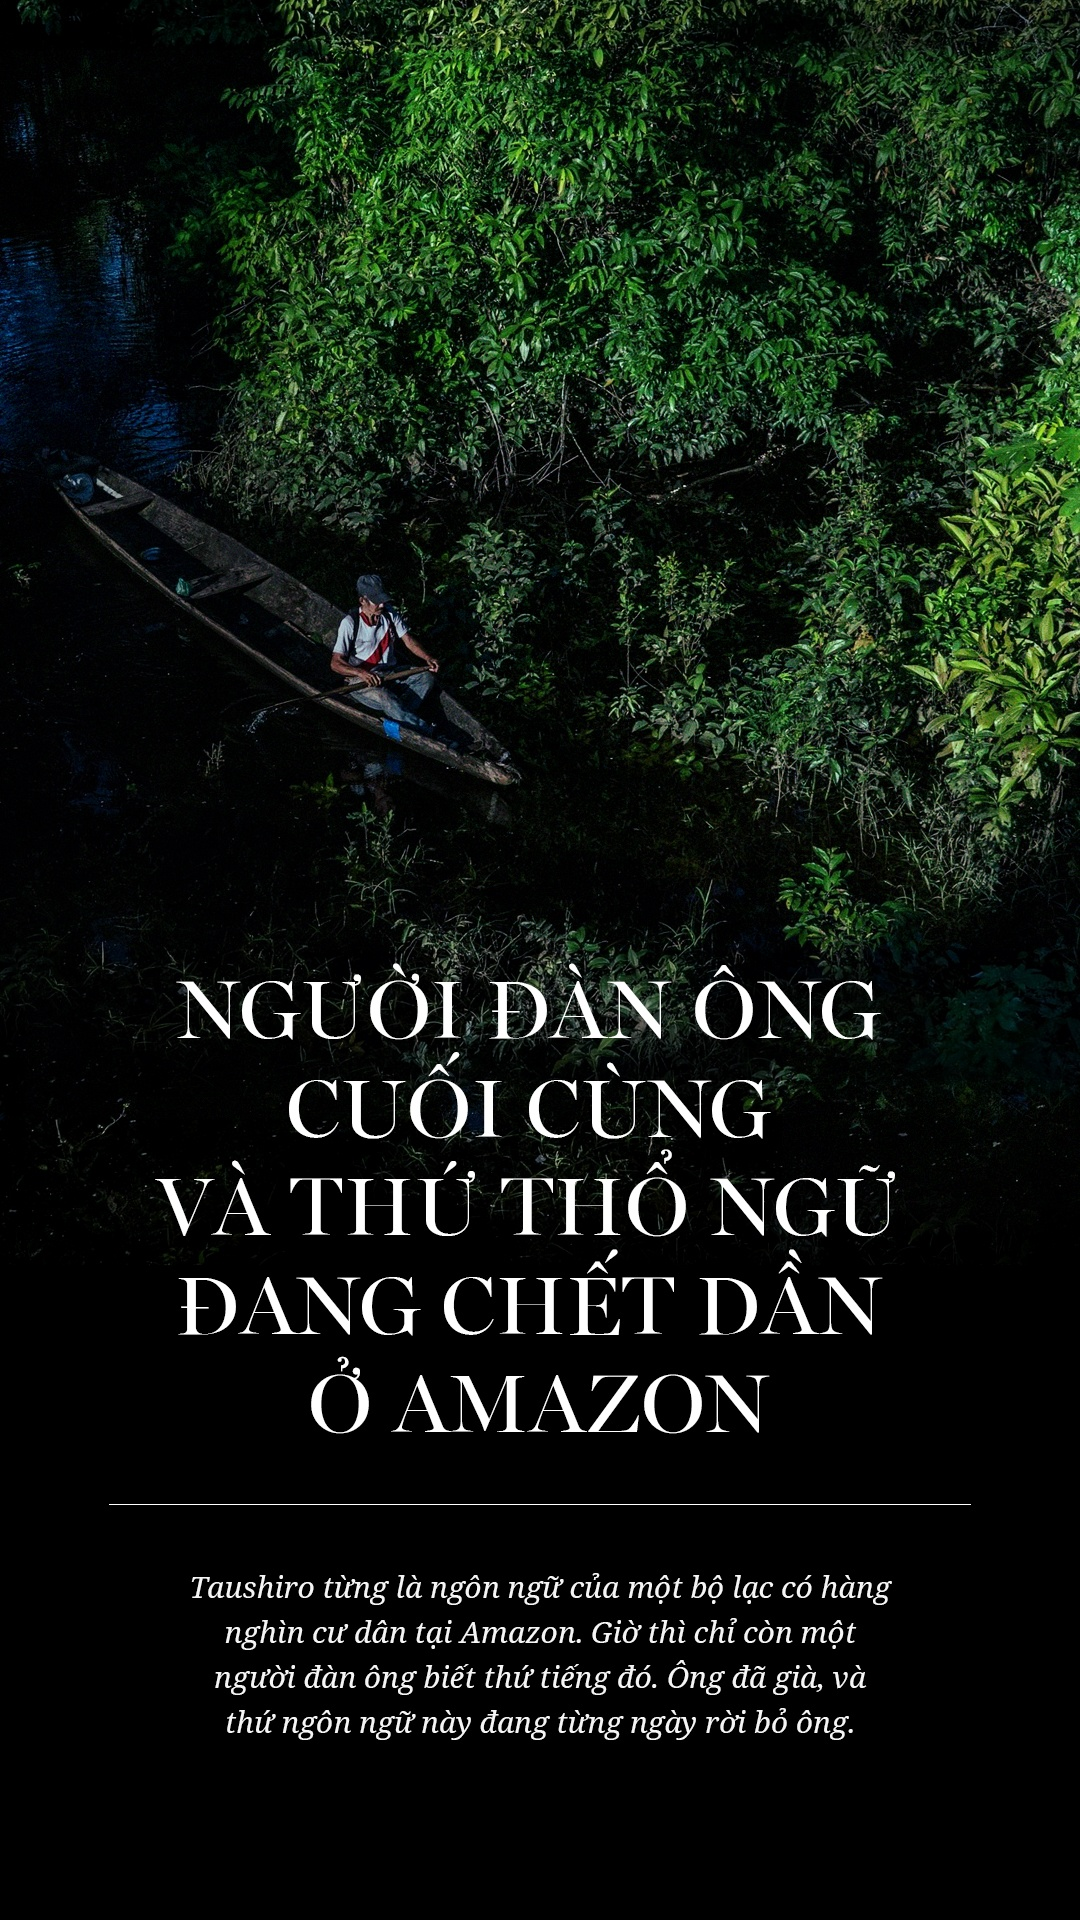 Amazon va nguoi dan ong cuoi cung cua mot ngon ngu hinh anh 1